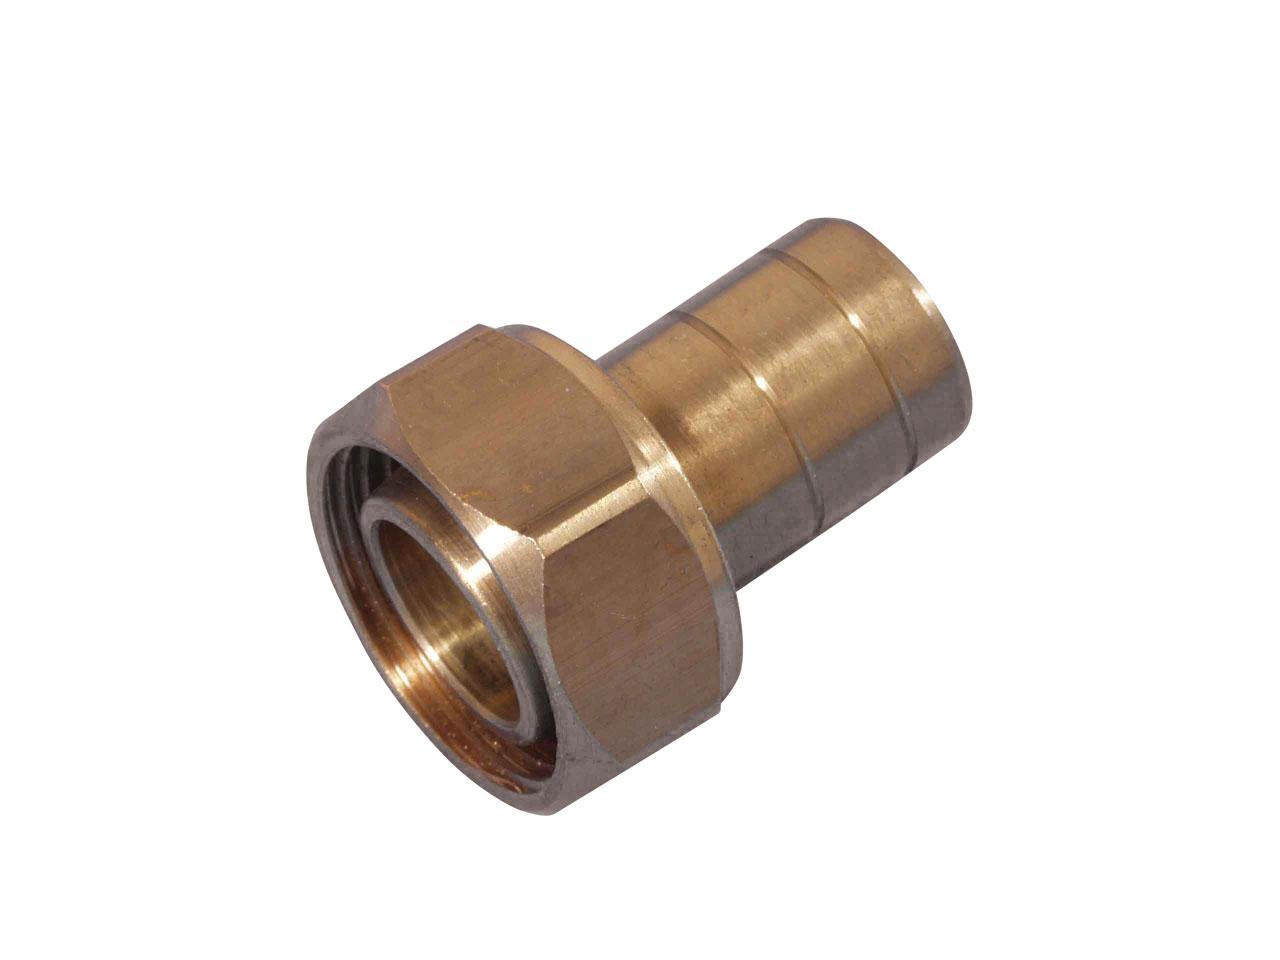 Cylinder Connector 1iBSP x 22mm Spigot